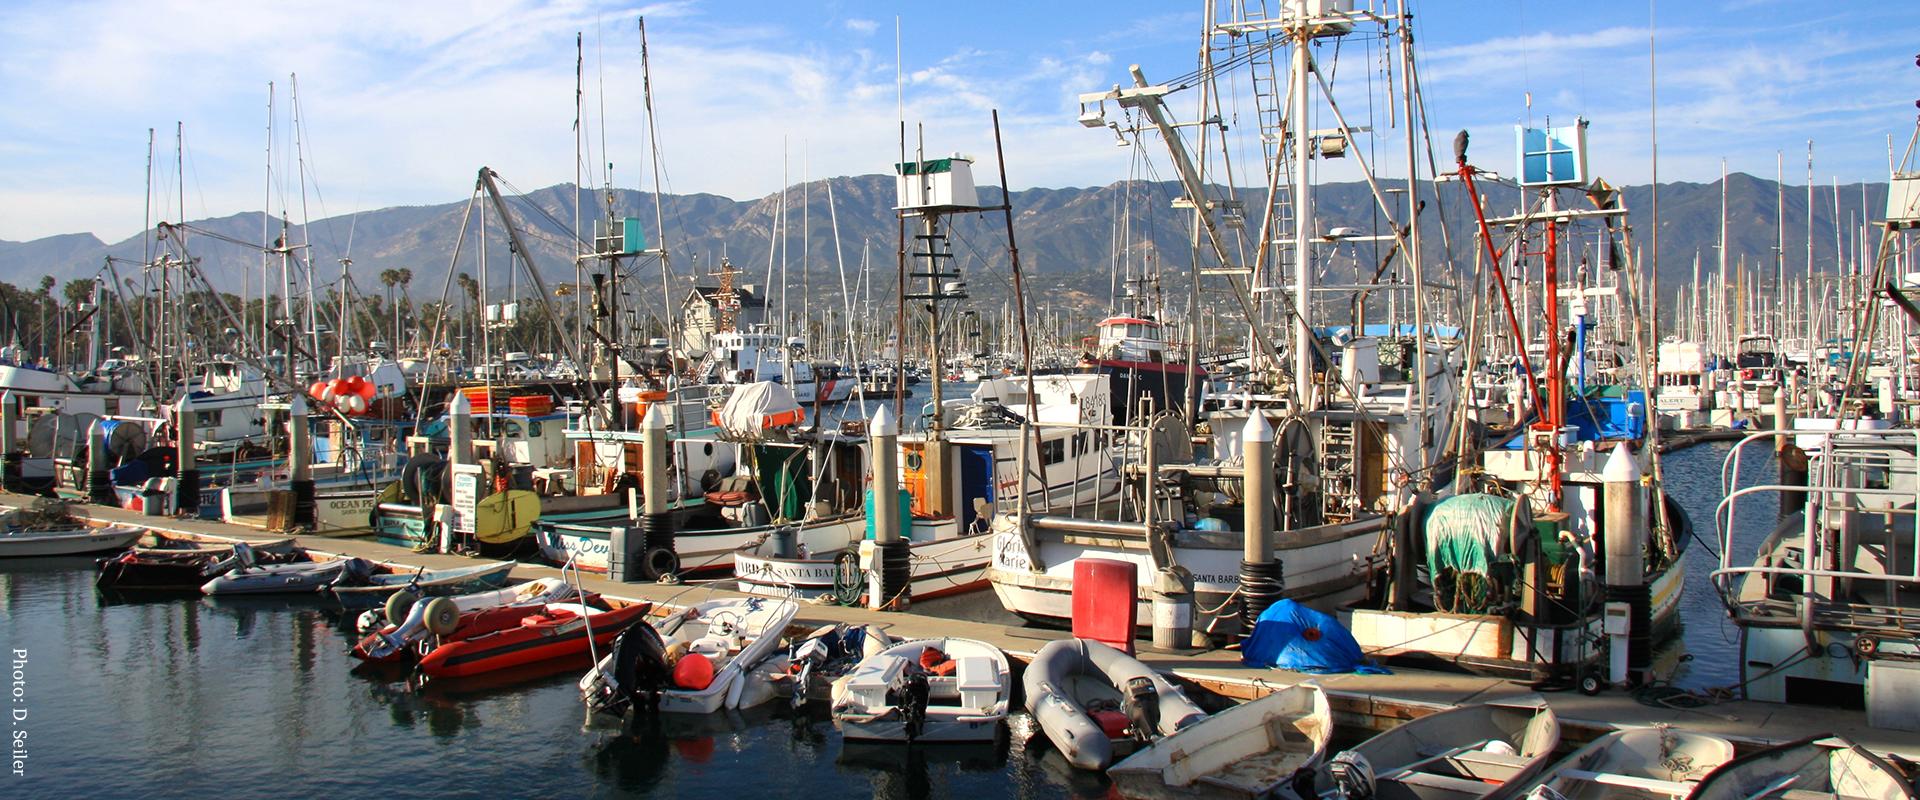 Santa Barbara dock